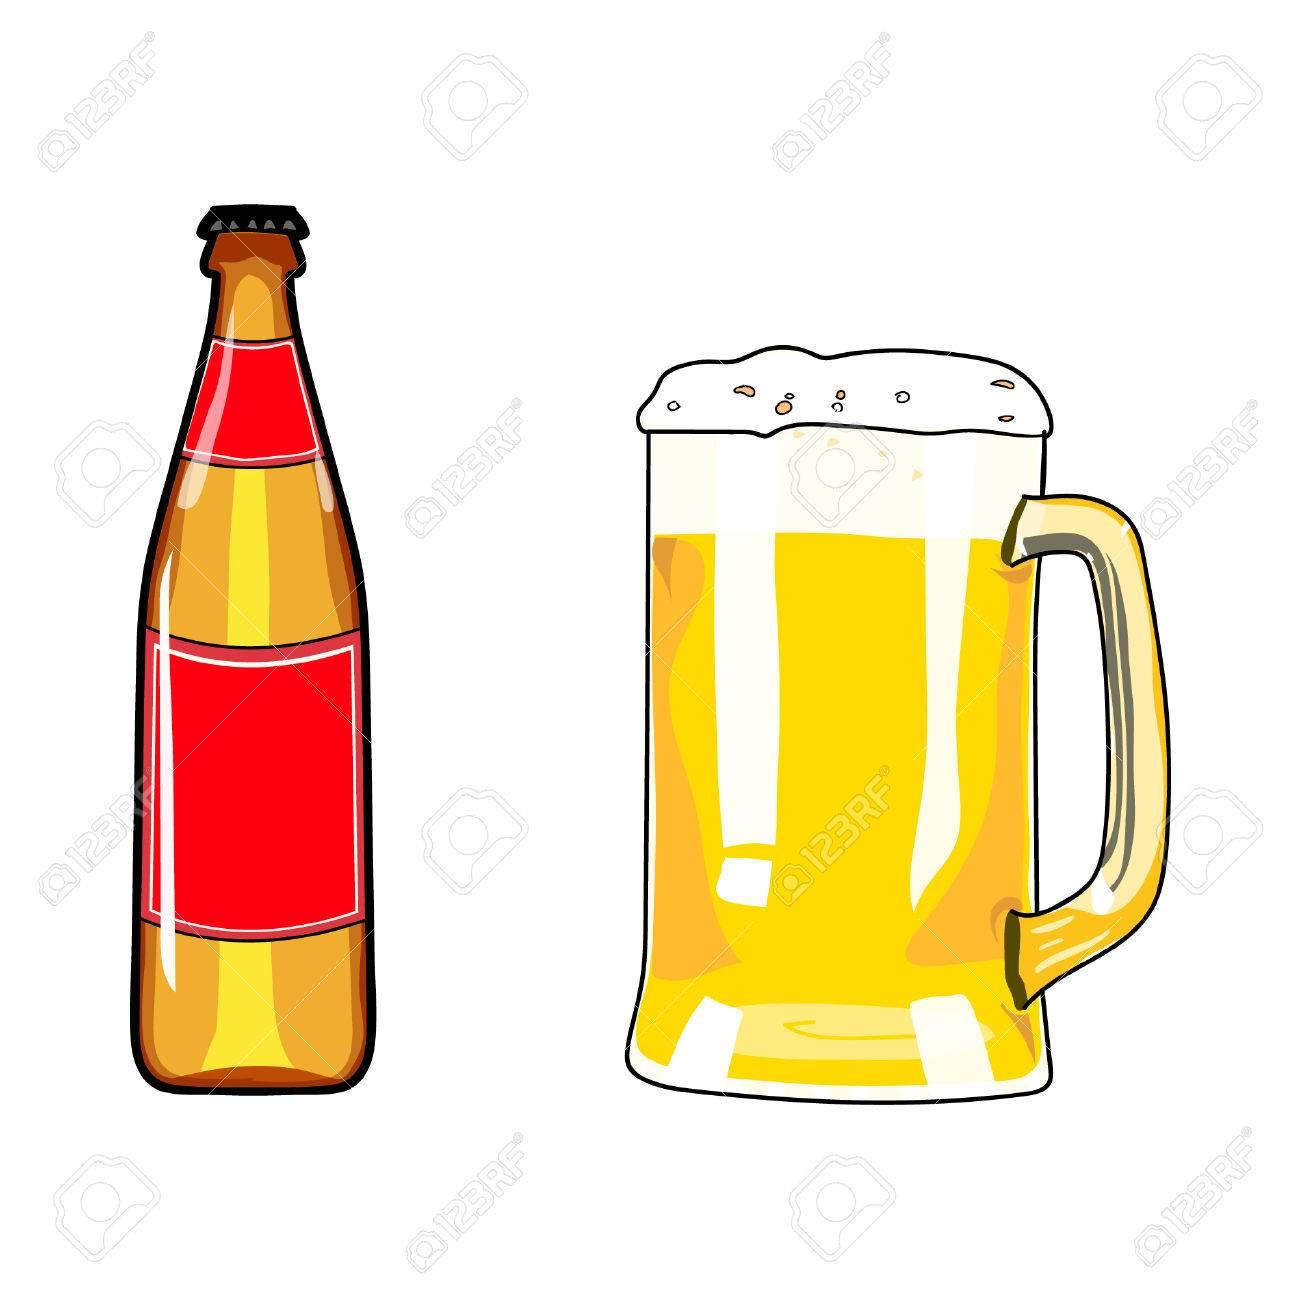 1300x1300 Beer Bottle And Mug Of Beer. Beer Icon. Beer Design Element